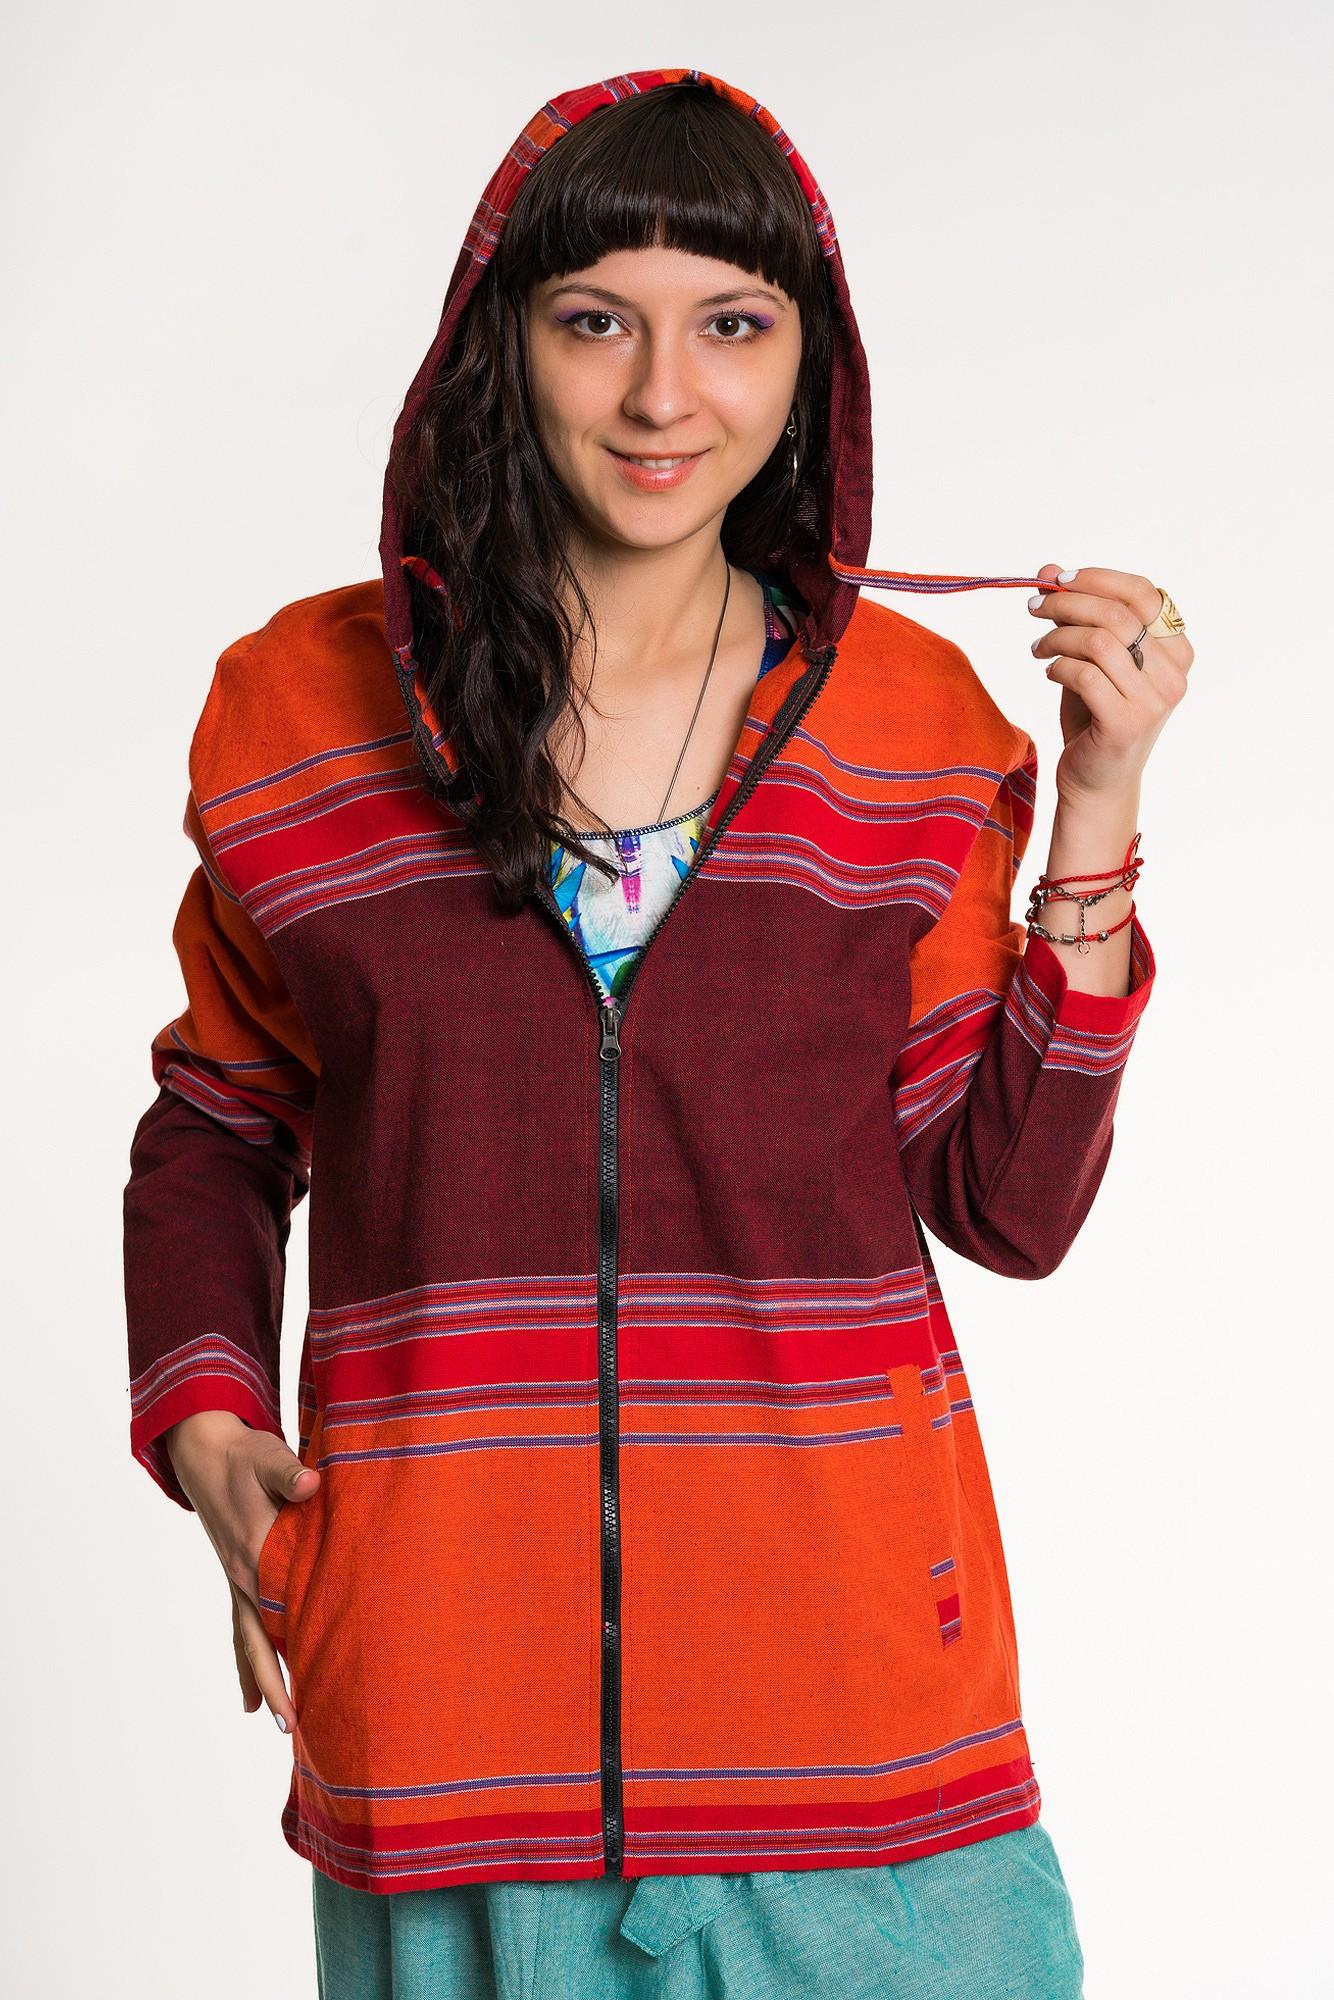 Jacheta rosu portocaliu cu gluga unisex